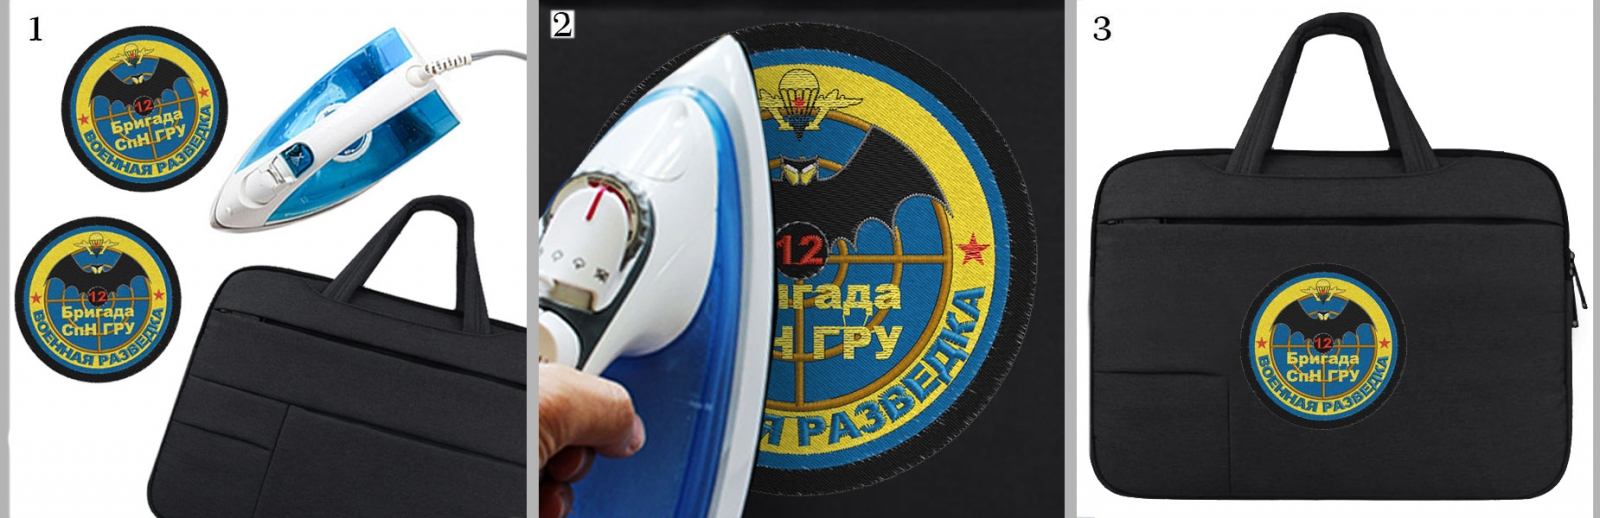 Шеврон ГРУ 12 бригада СпН на сумке